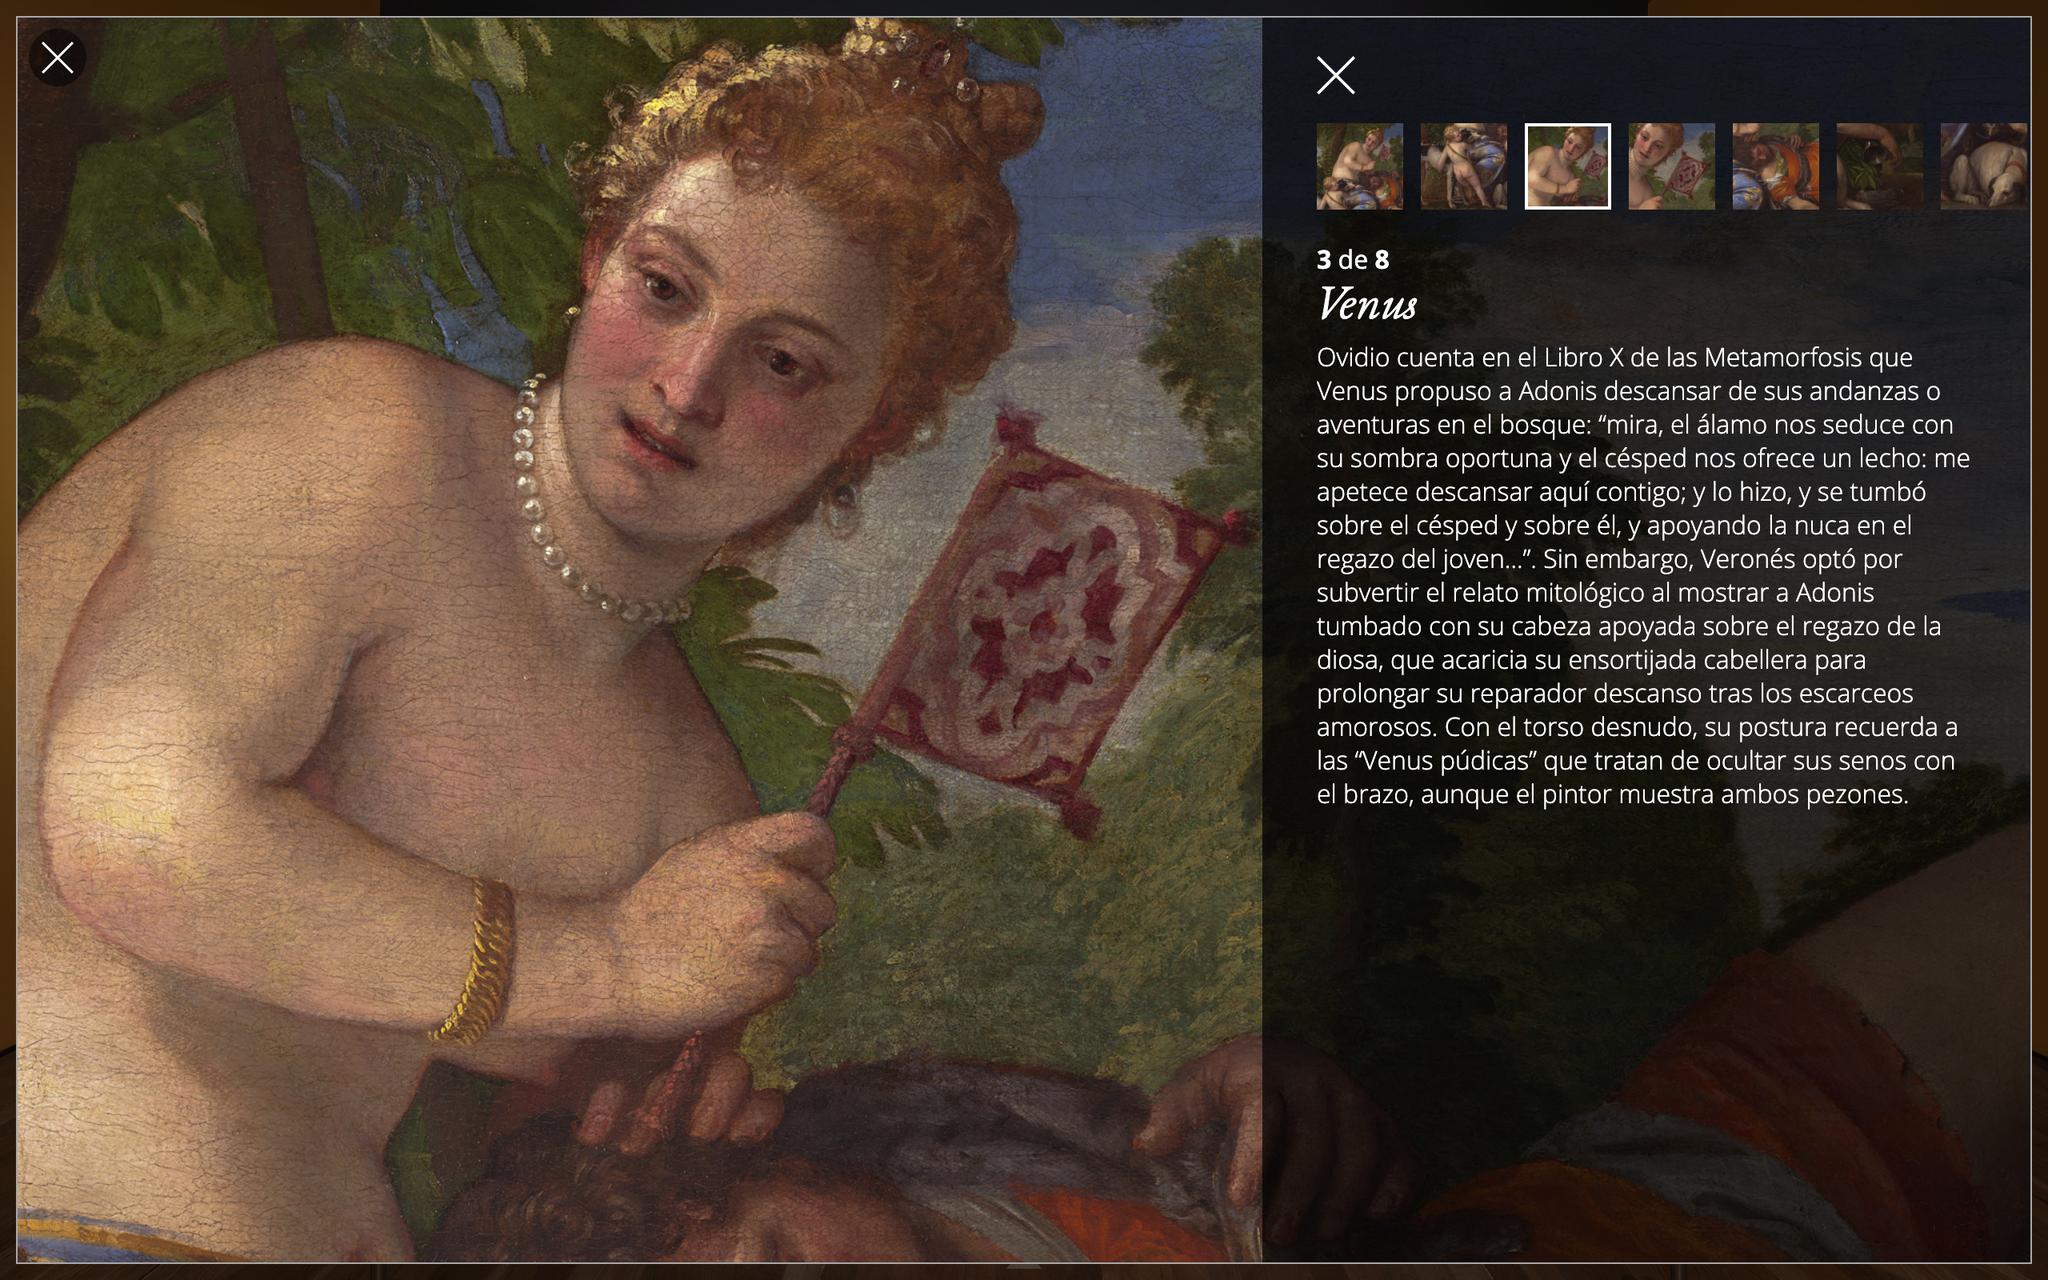 Imagen de la obra Venus y Adonis ya dentro del gigapixel donde se ve el storytelling